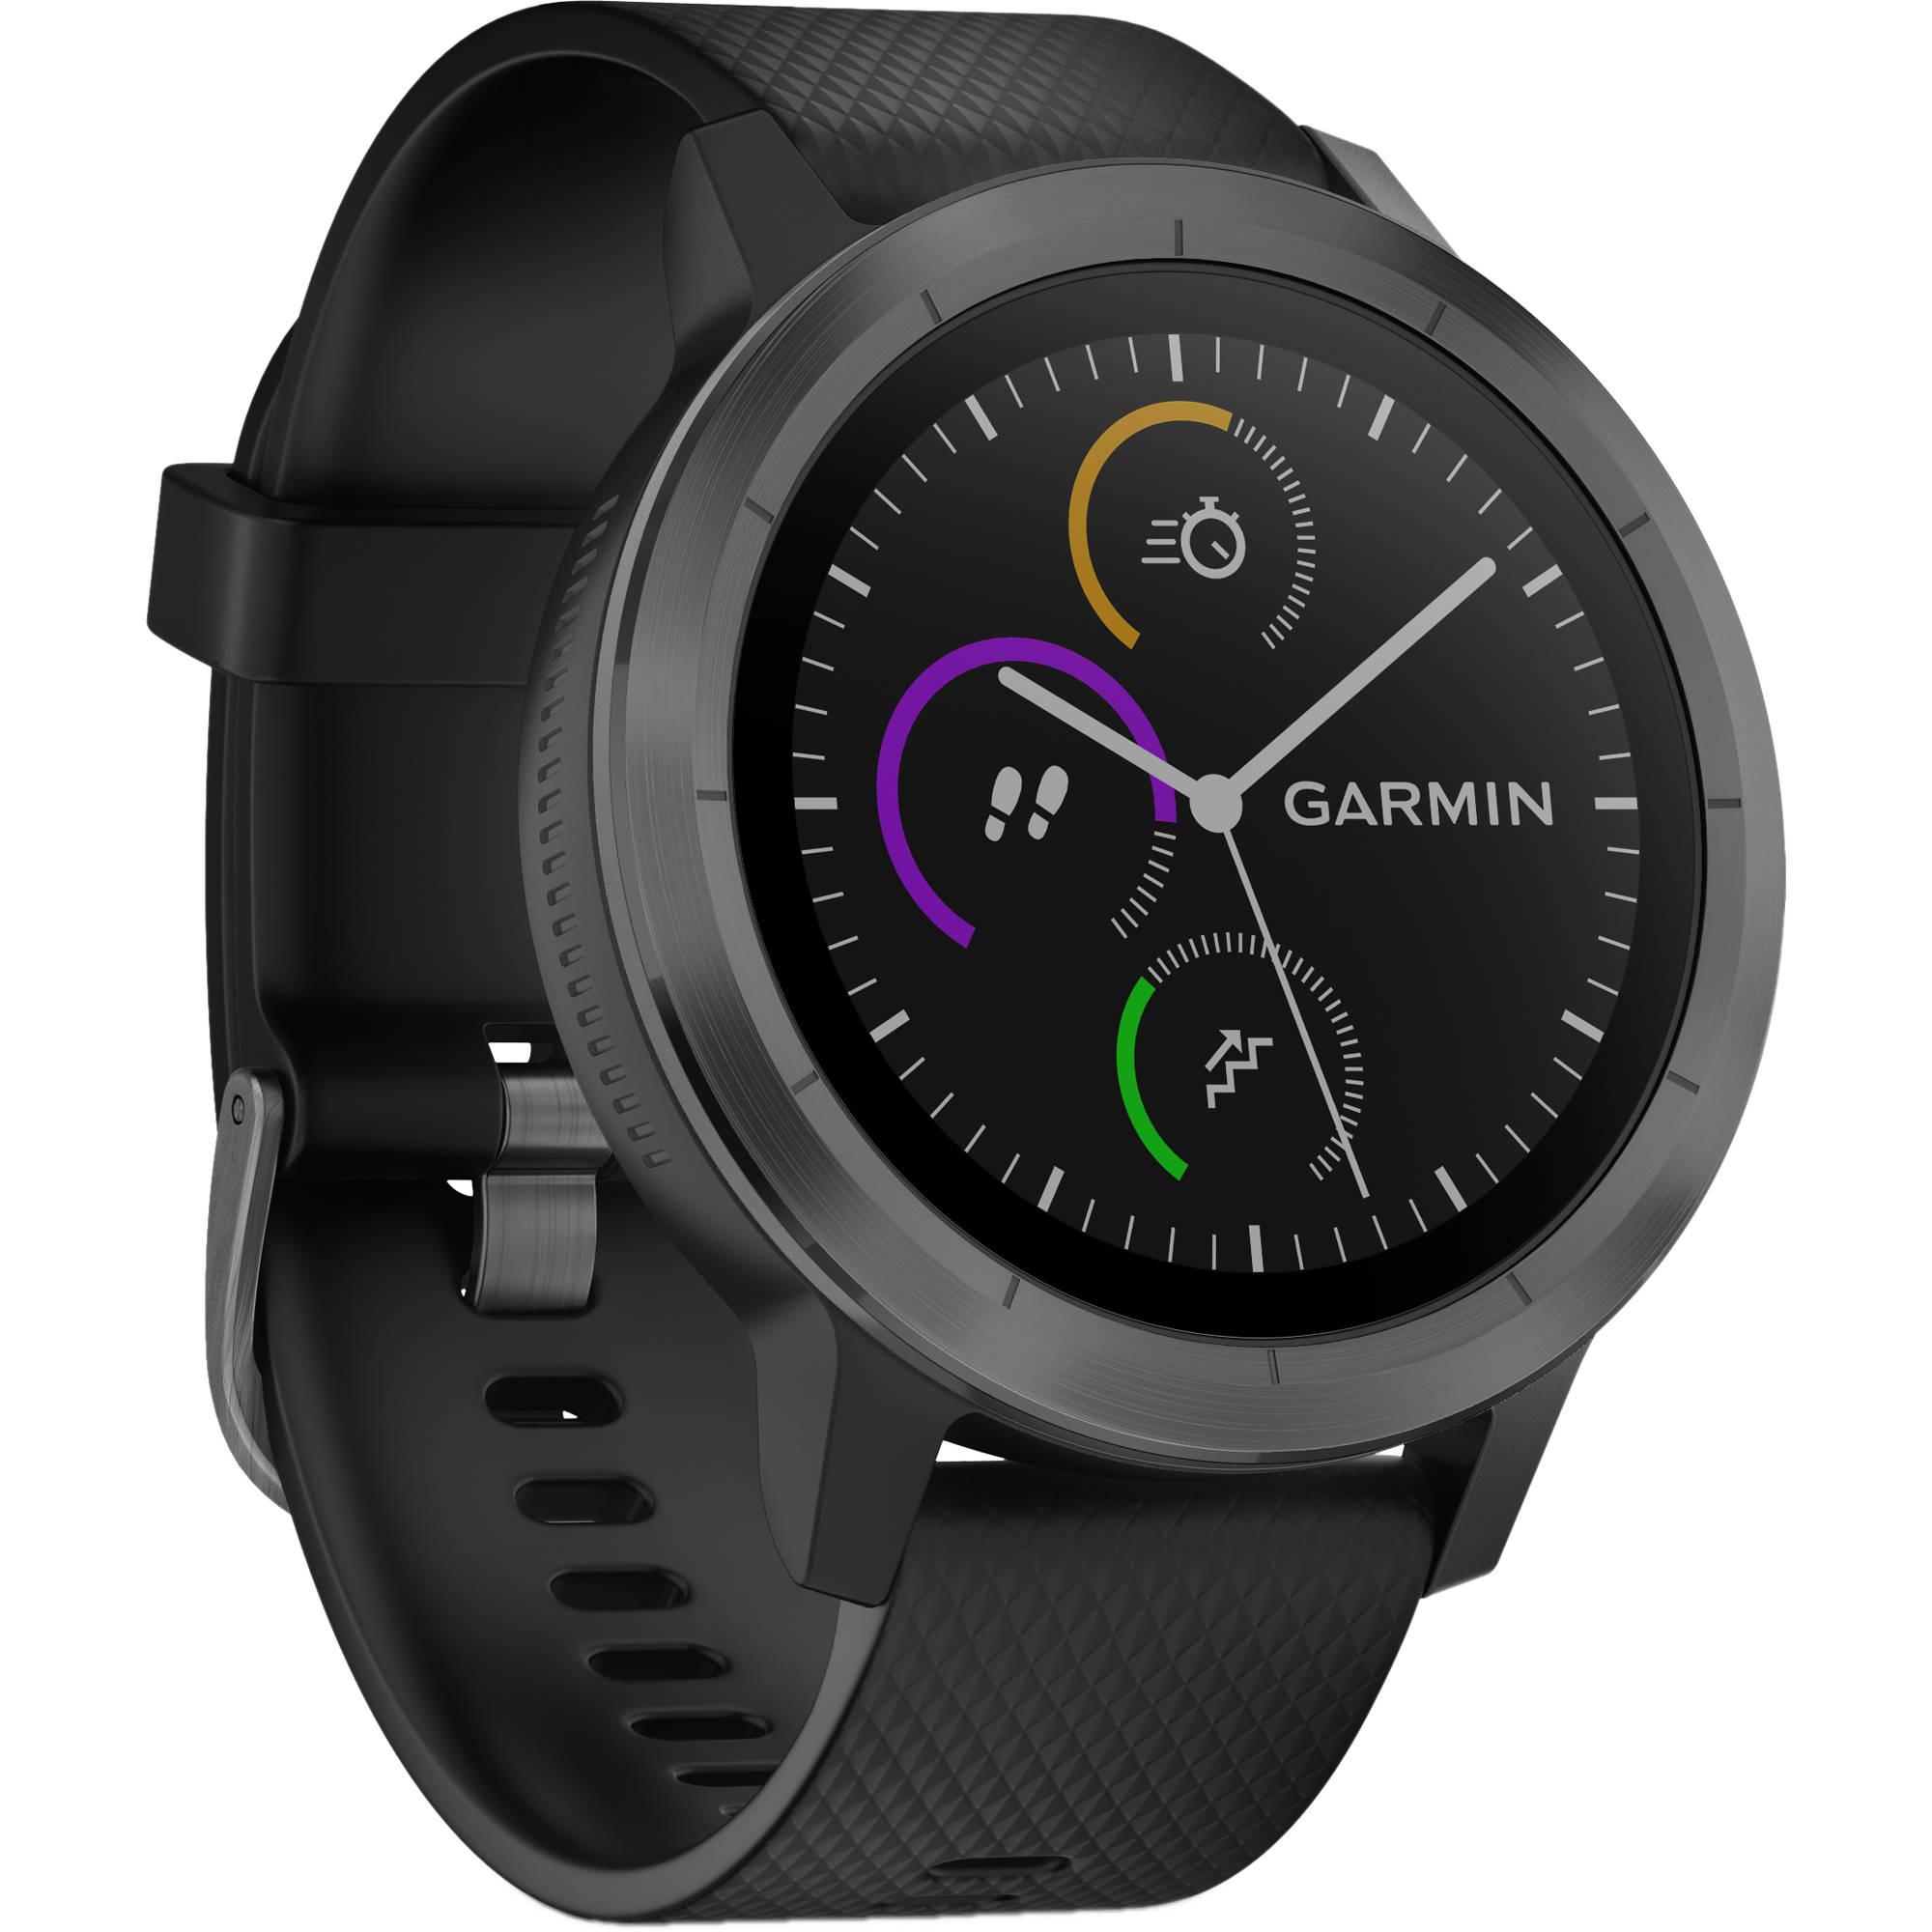 d70f627ff 6ave Electronics: Garmin vivoactive 3 (Black with Slate Hardware ...